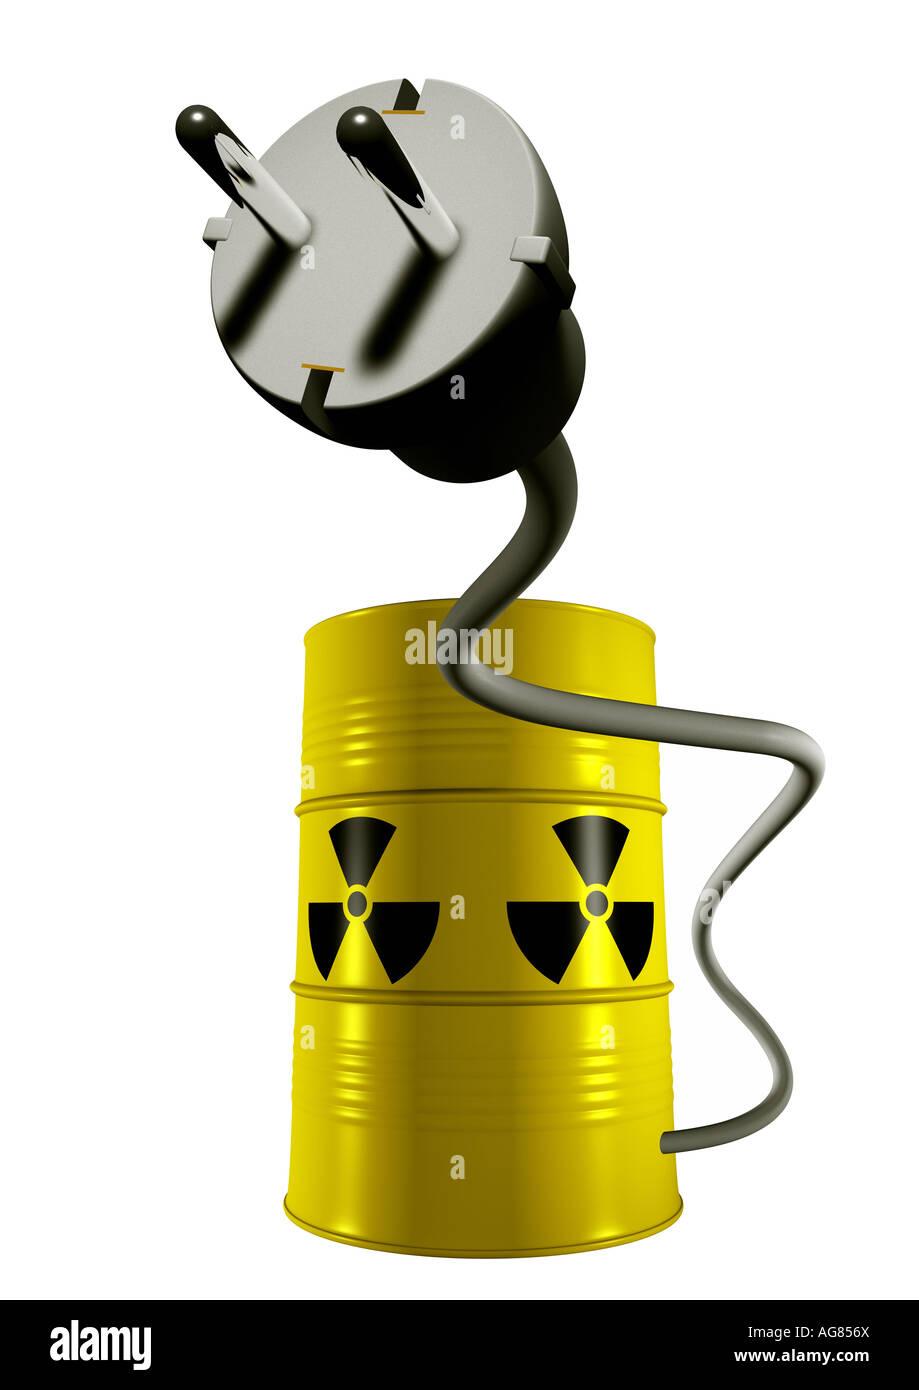 nuclear energy Kernenergie Atomkraft - Stock Image